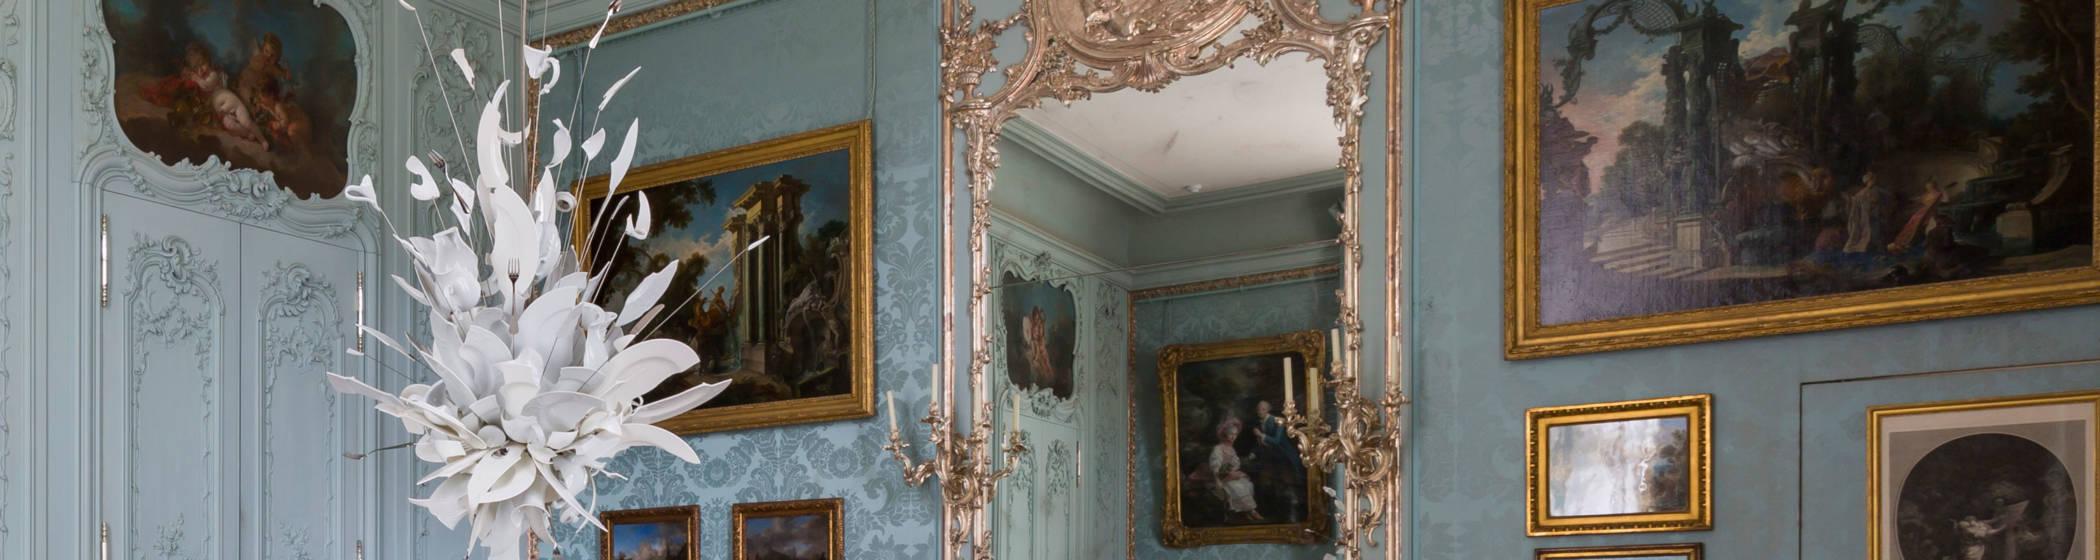 Beautiful Backdrops For Your Virtual Meetings Waddesdon Manor